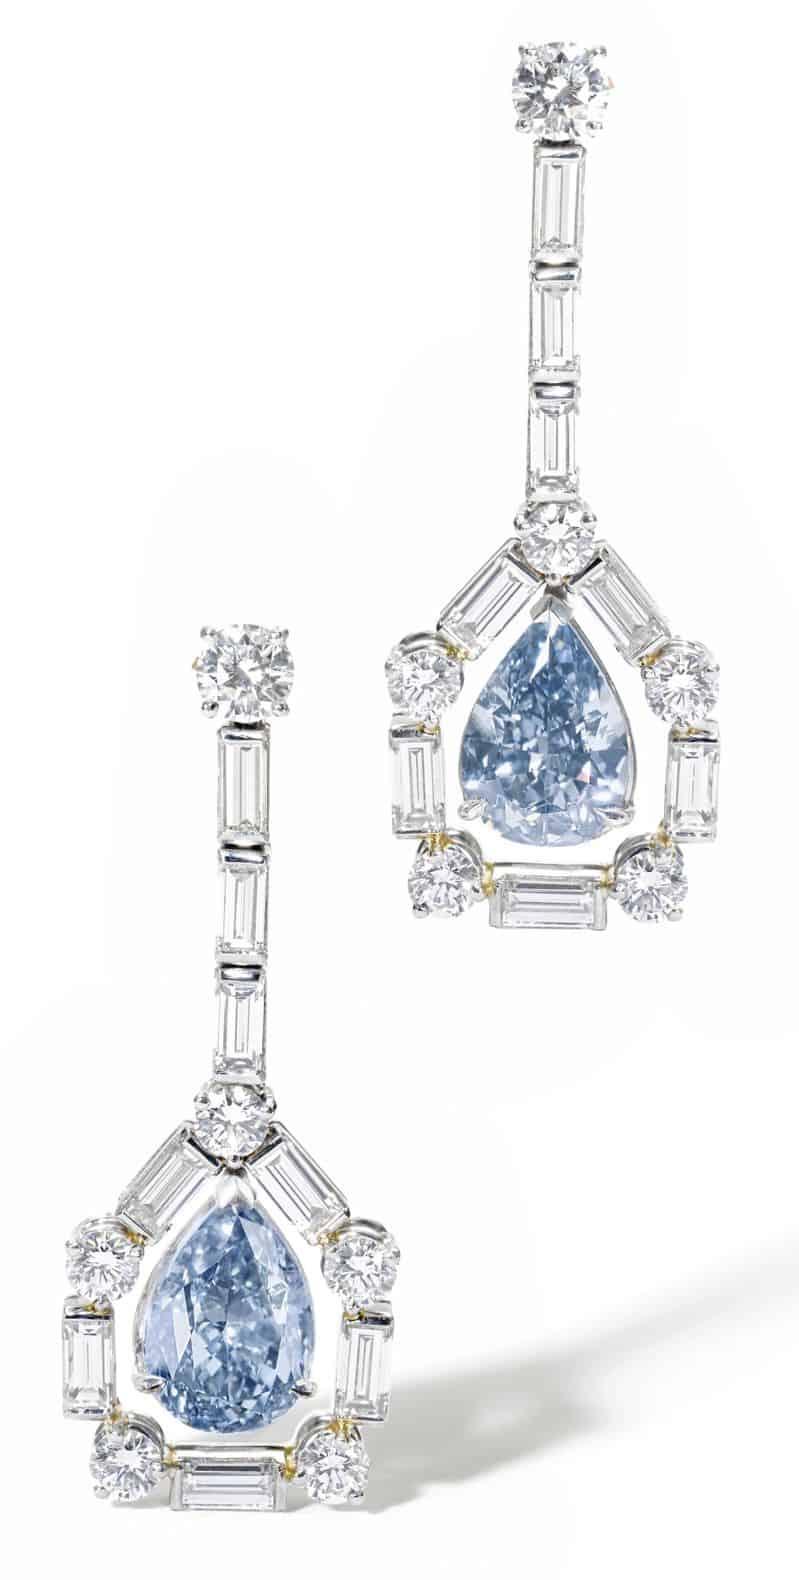 LOT 570 - RARE PAIR OF FANCY VIVID BLUE DIAMOND PENDENT EARRINGS